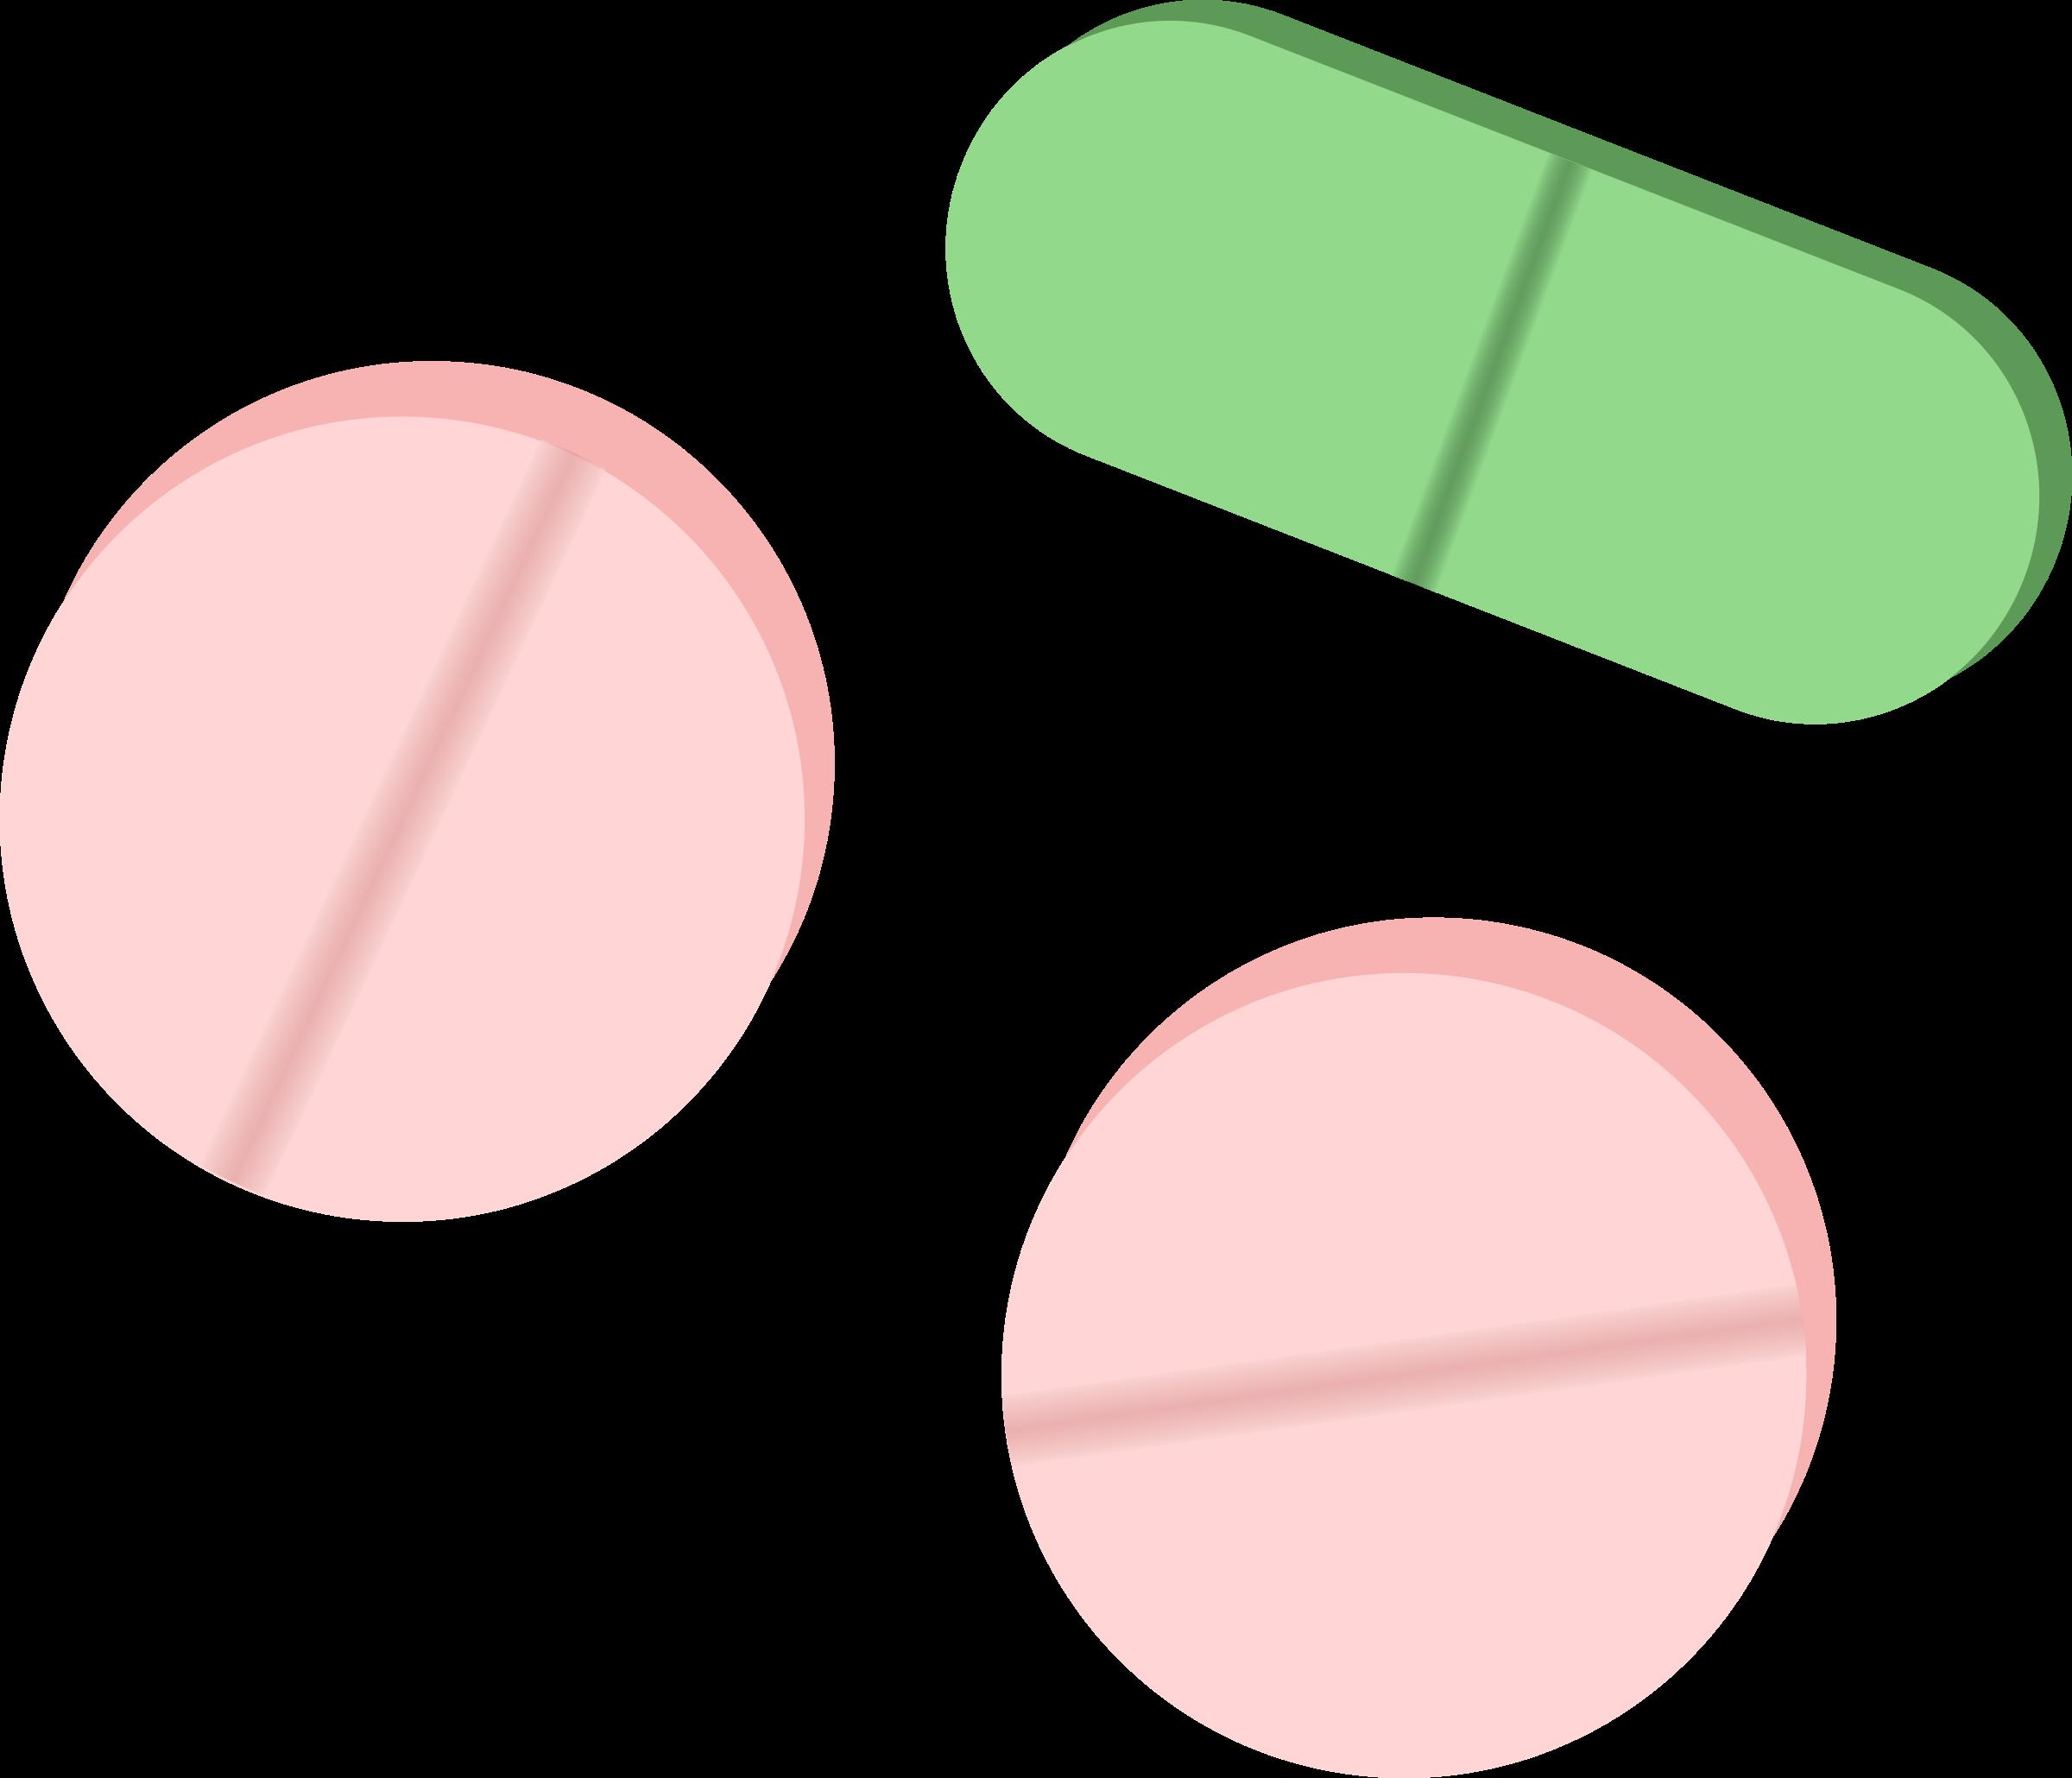 Pills by krzysiu